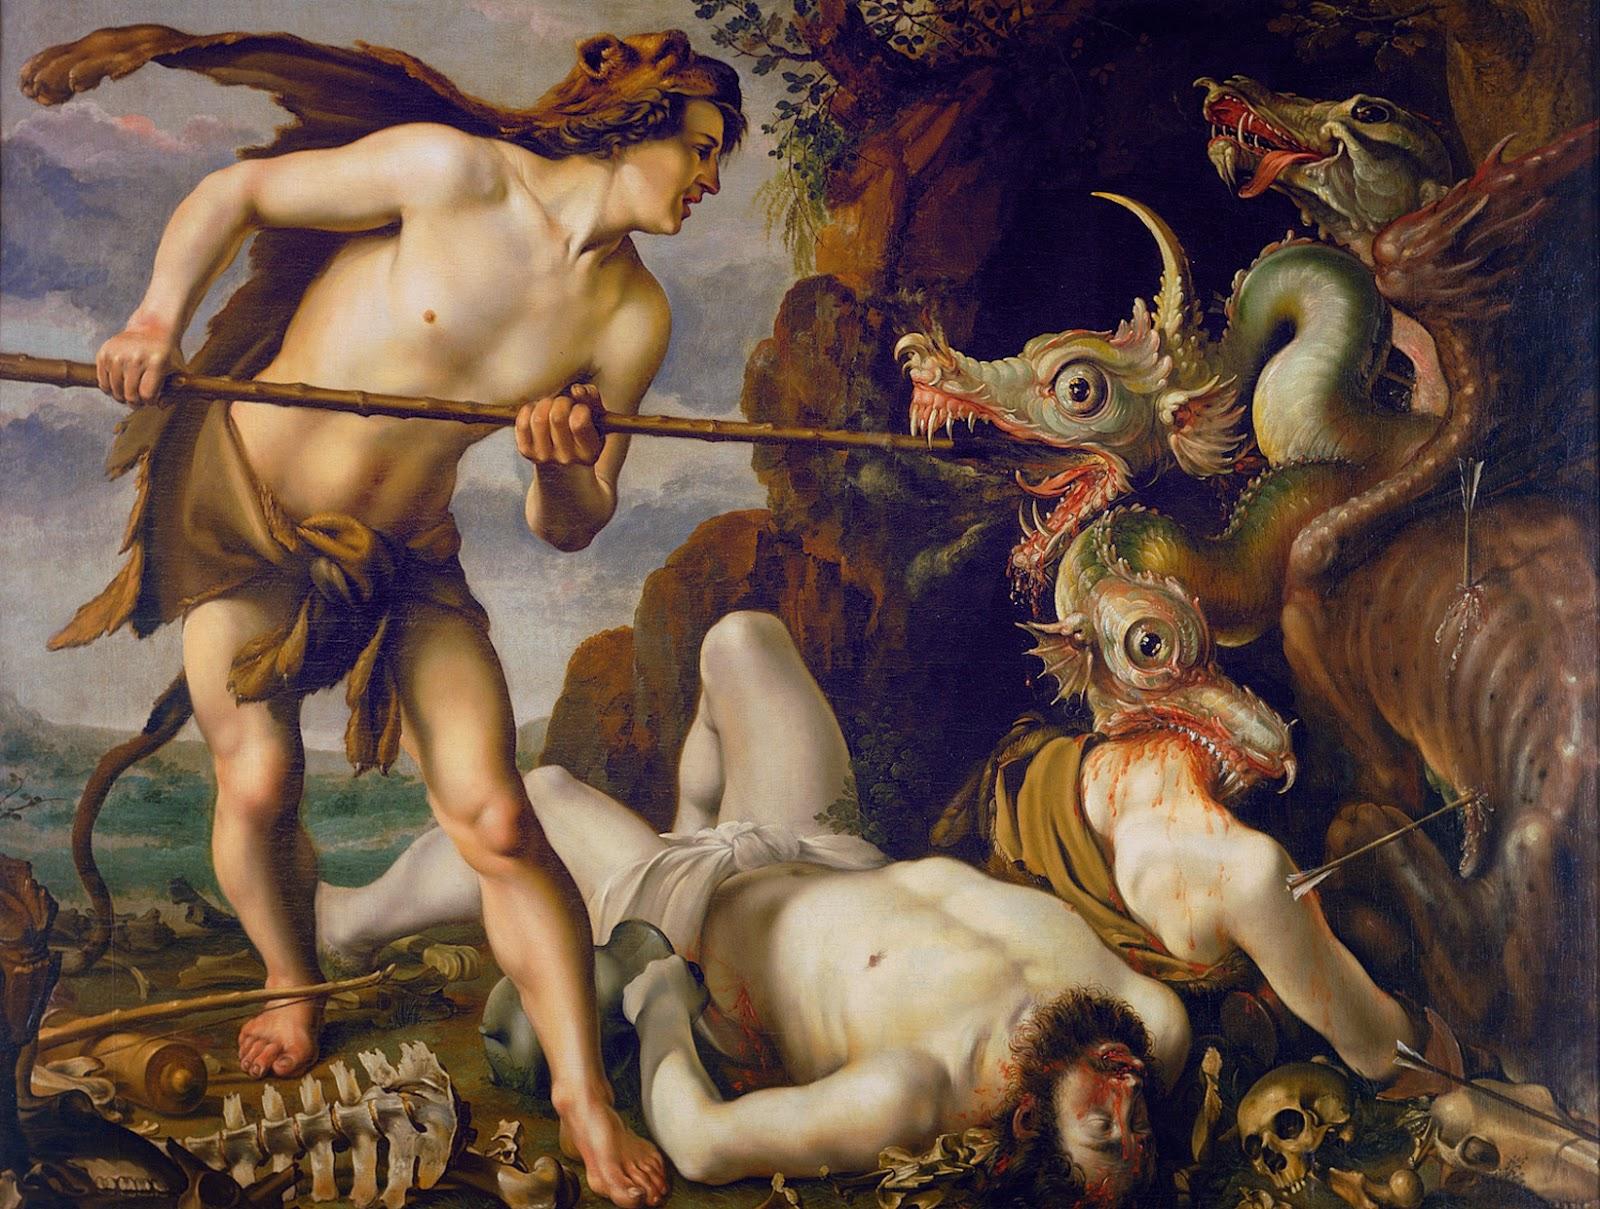 Hendrick_Goltzius_Cadmus_Statens_Museum_for_Kunst_1183